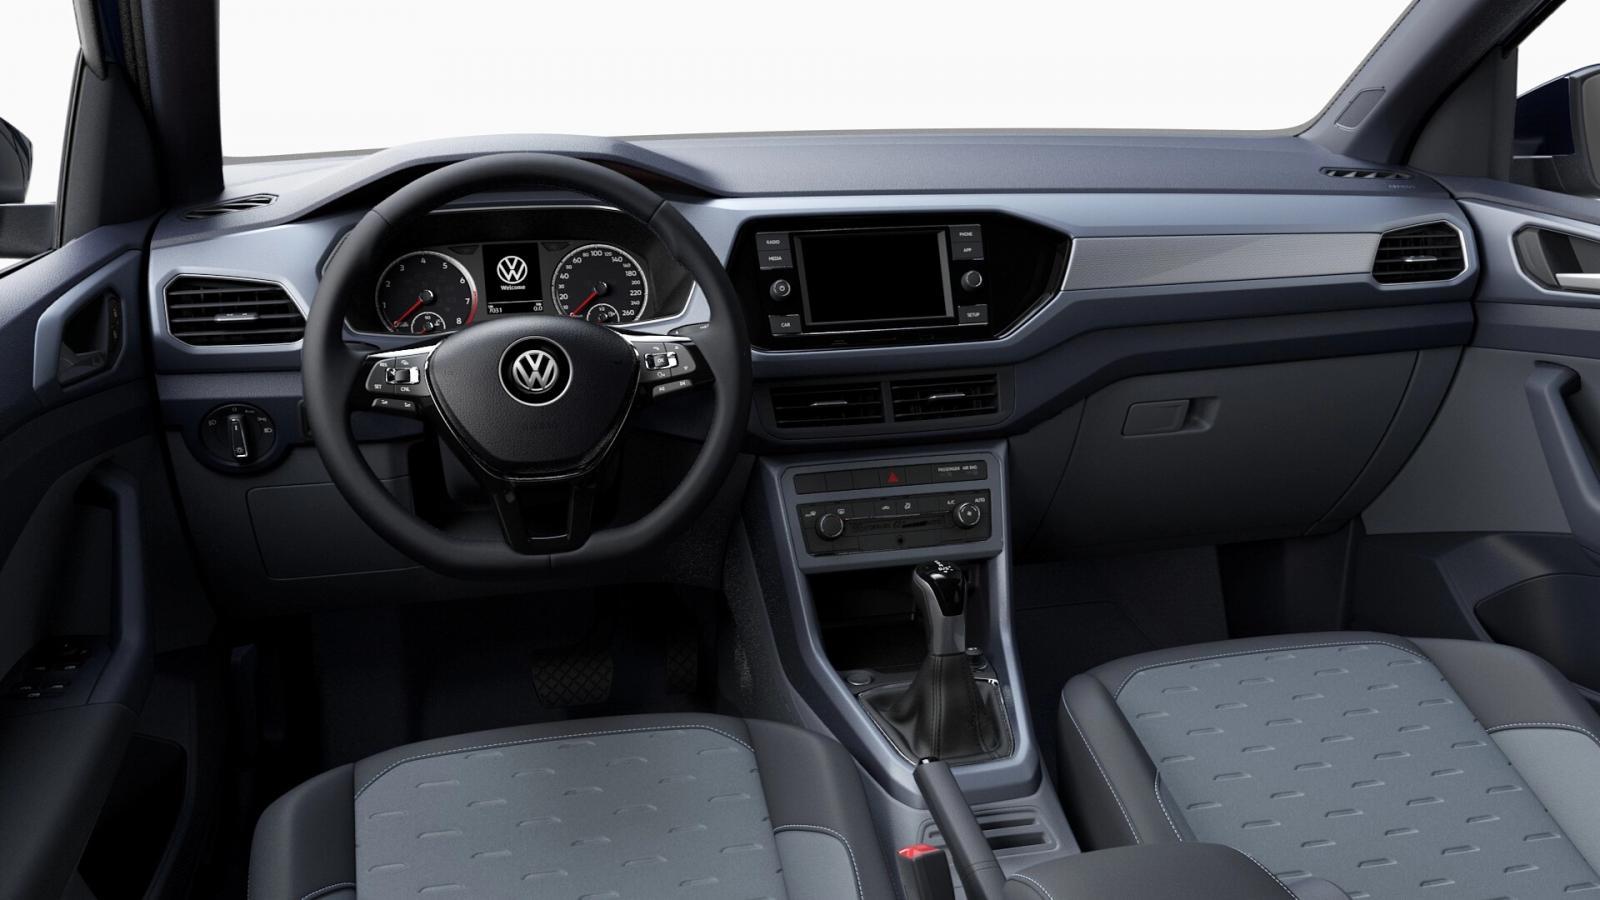 Hyundai Creta GLS Premium 2021 Volkswagen T-Cross Comfortline 2021 comparativa